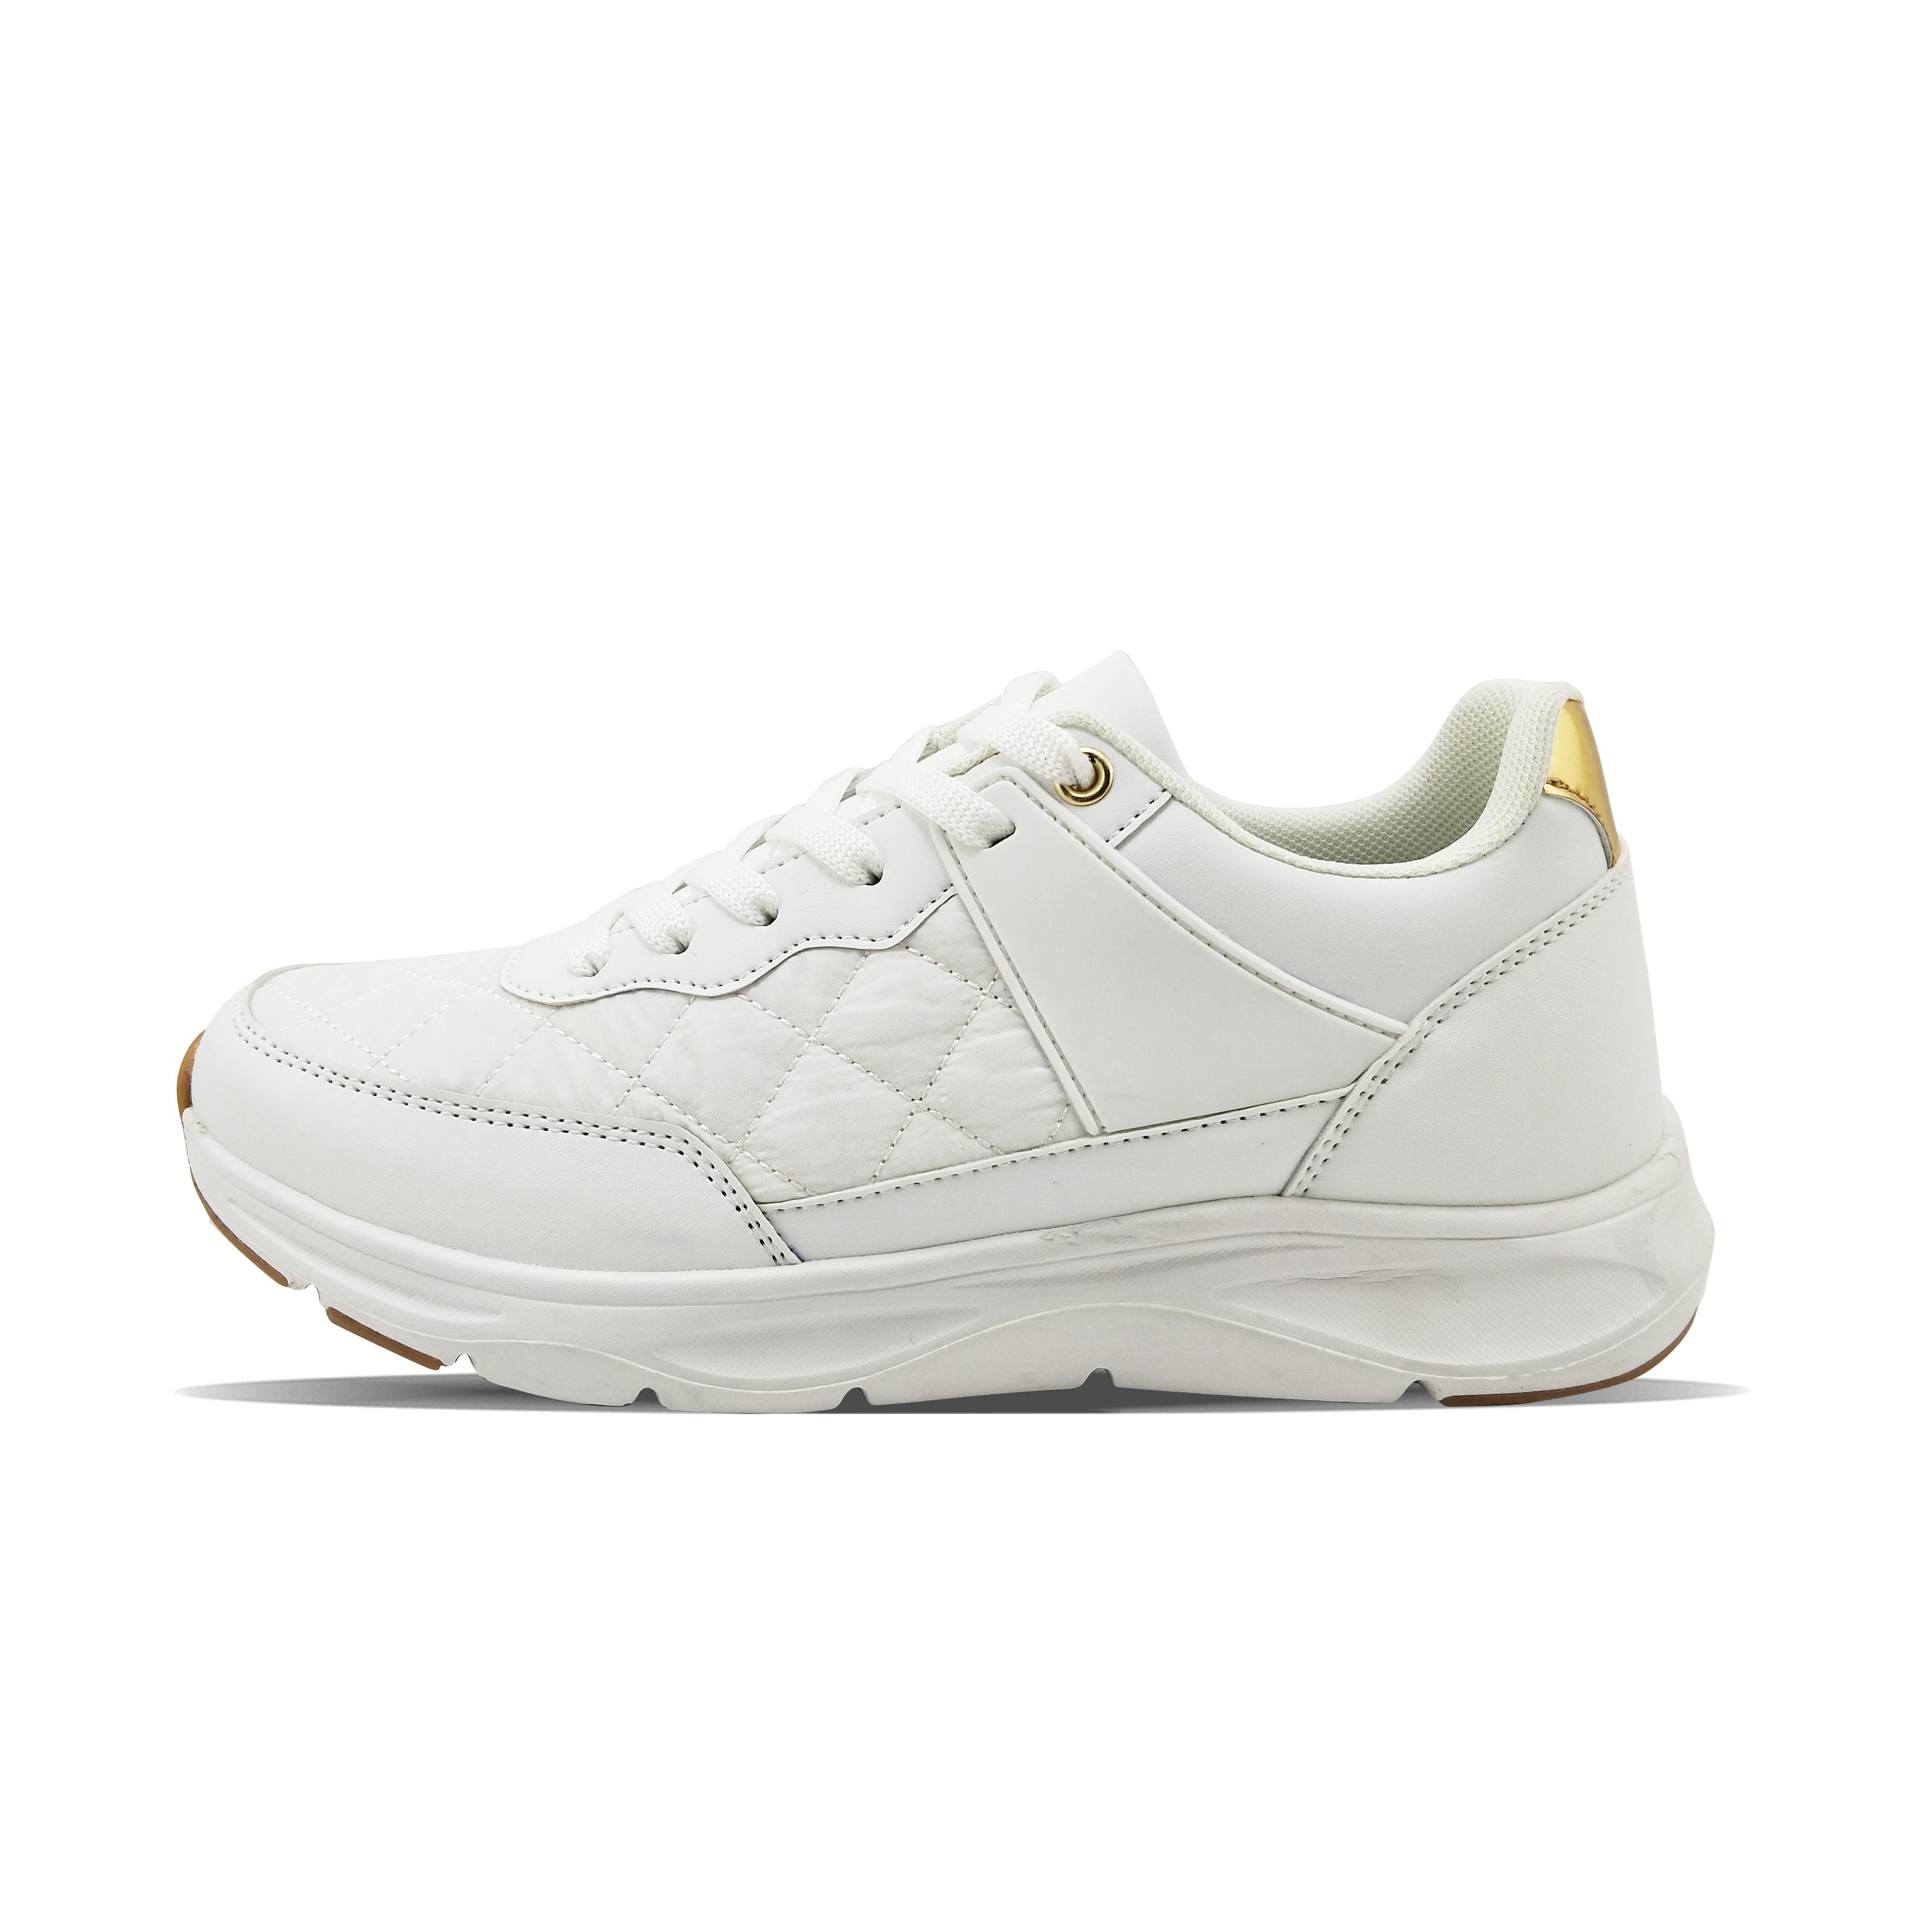 metallic leather white women's fashion casual shoes